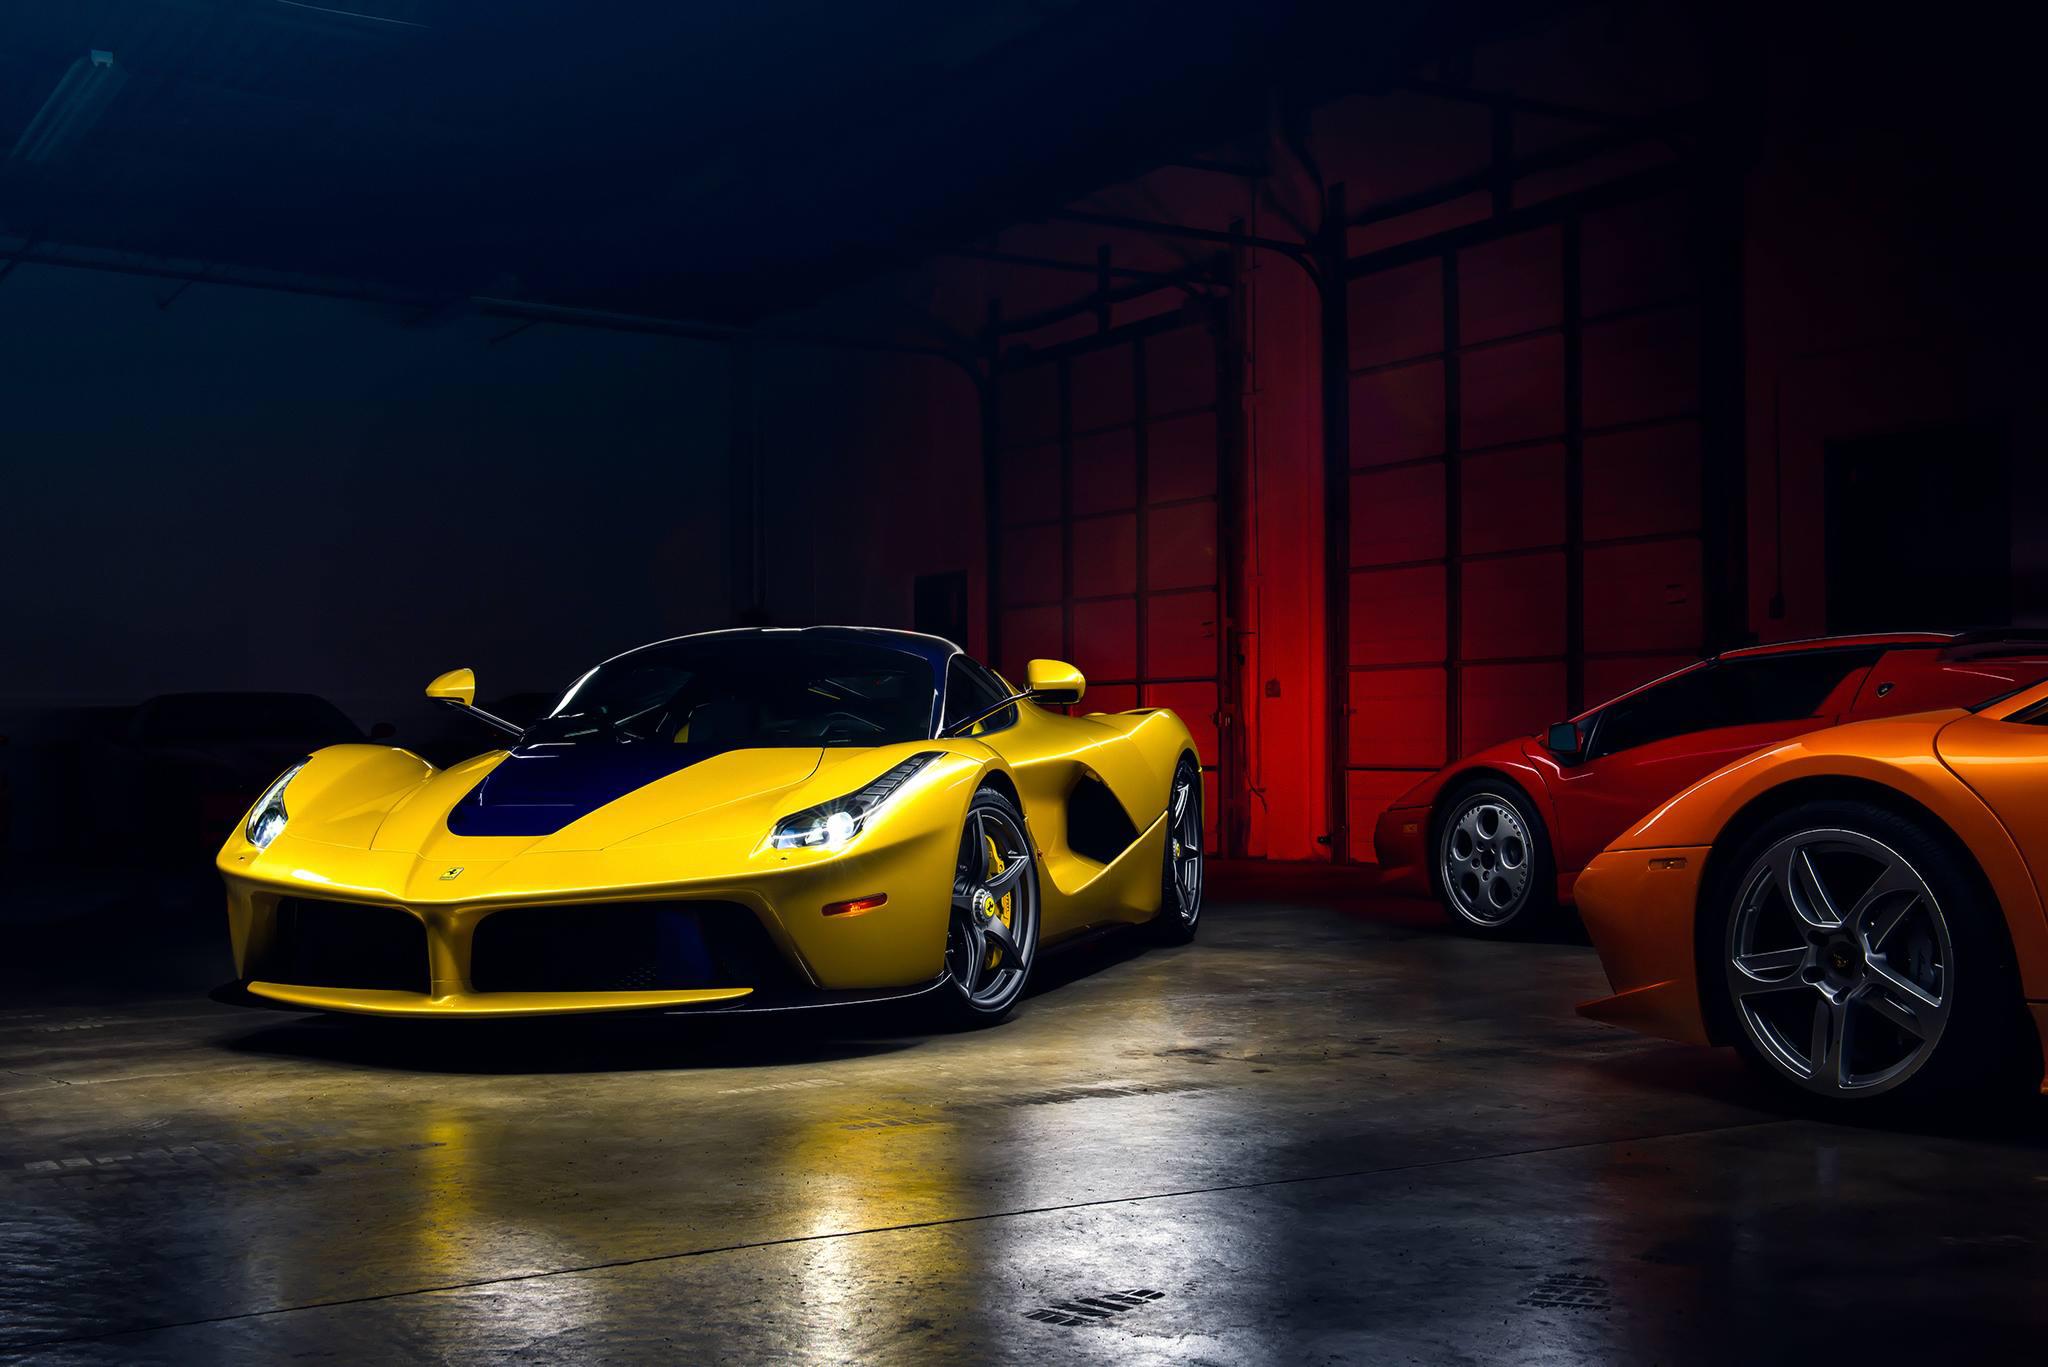 Ferrari Laferrari Ferrari Supercar Yellow Car Car Vehicle Wallpaper Resolution 2048x1367 Id 749119 Wallha Com